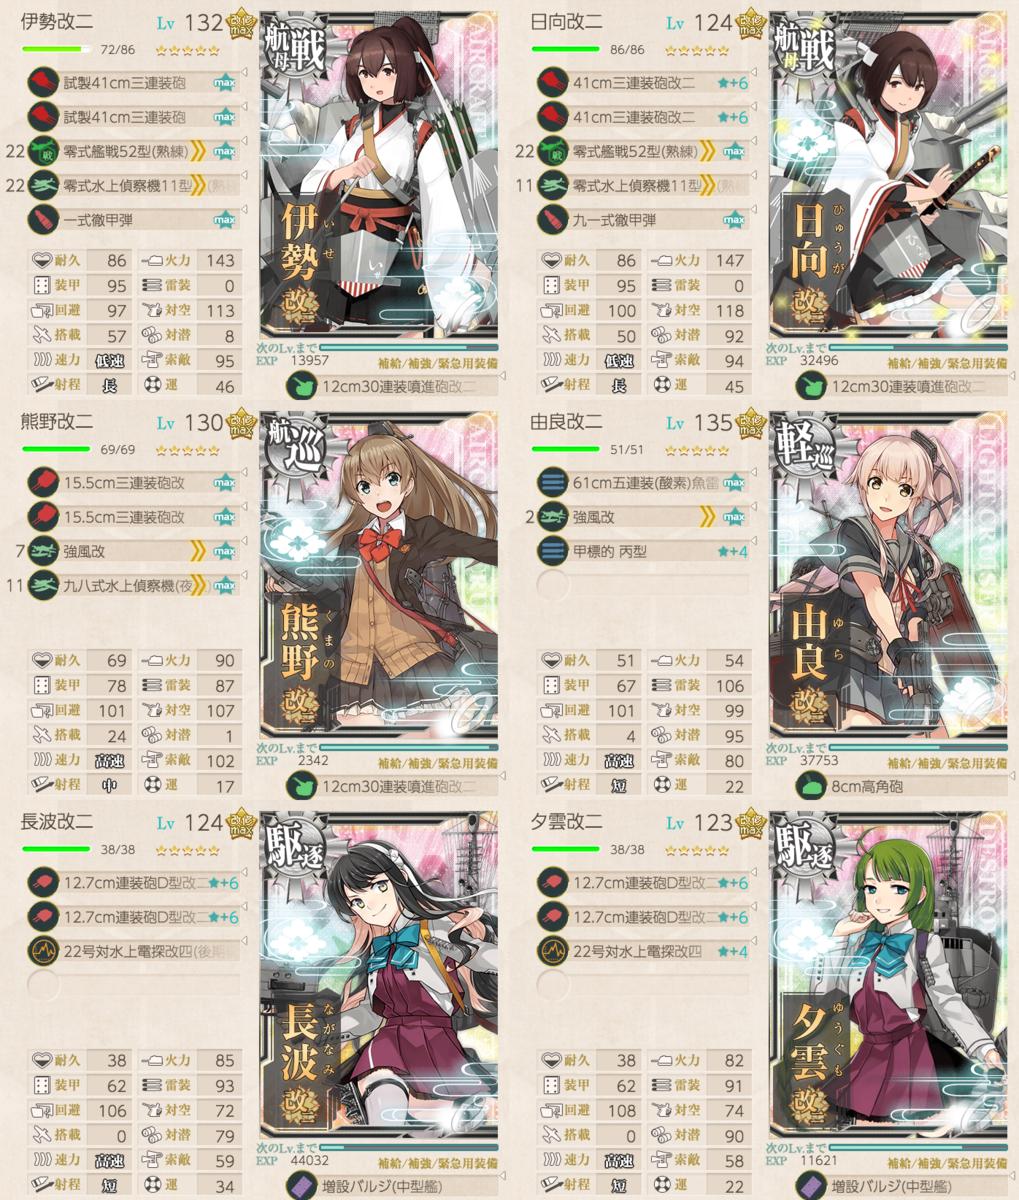 f:id:nameless_admiral:20190328155519p:plain